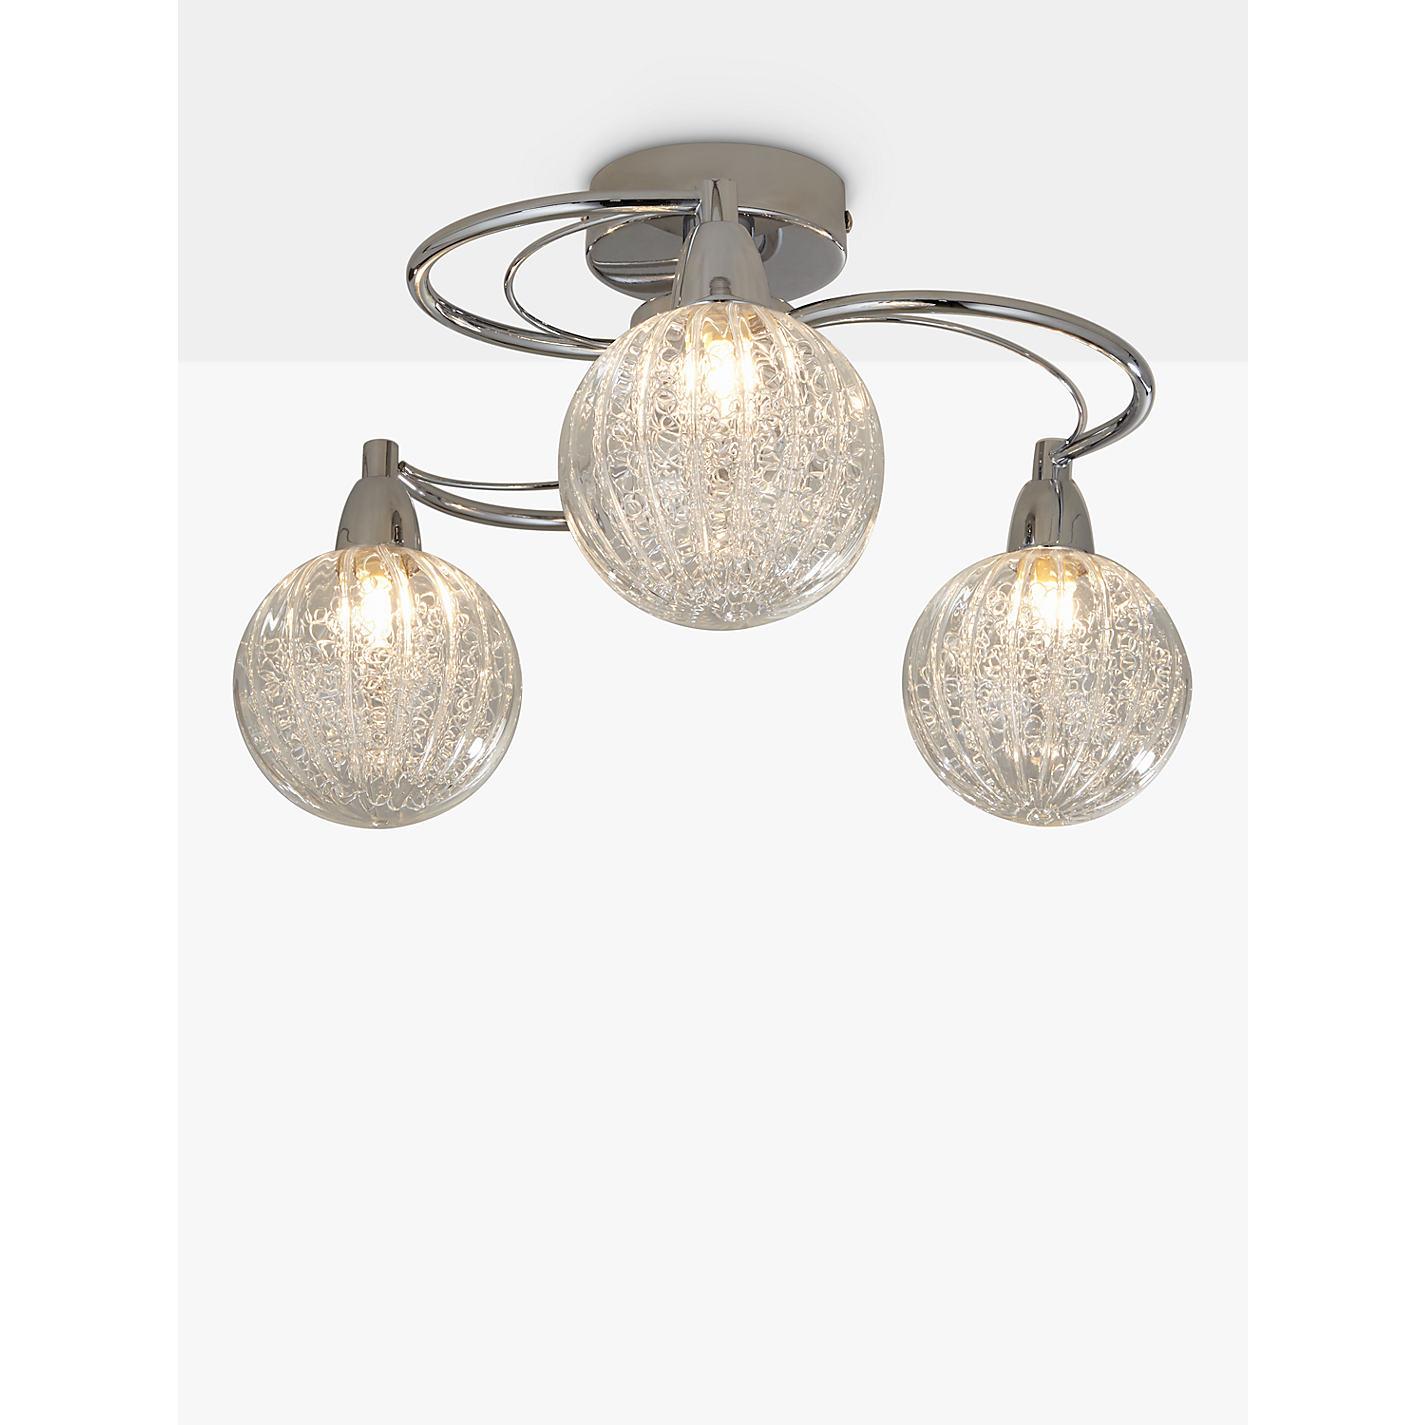 Bathroom Ceiling Lights John Lewis buy john lewis robertson ceiling light, 3 arm | john lewis